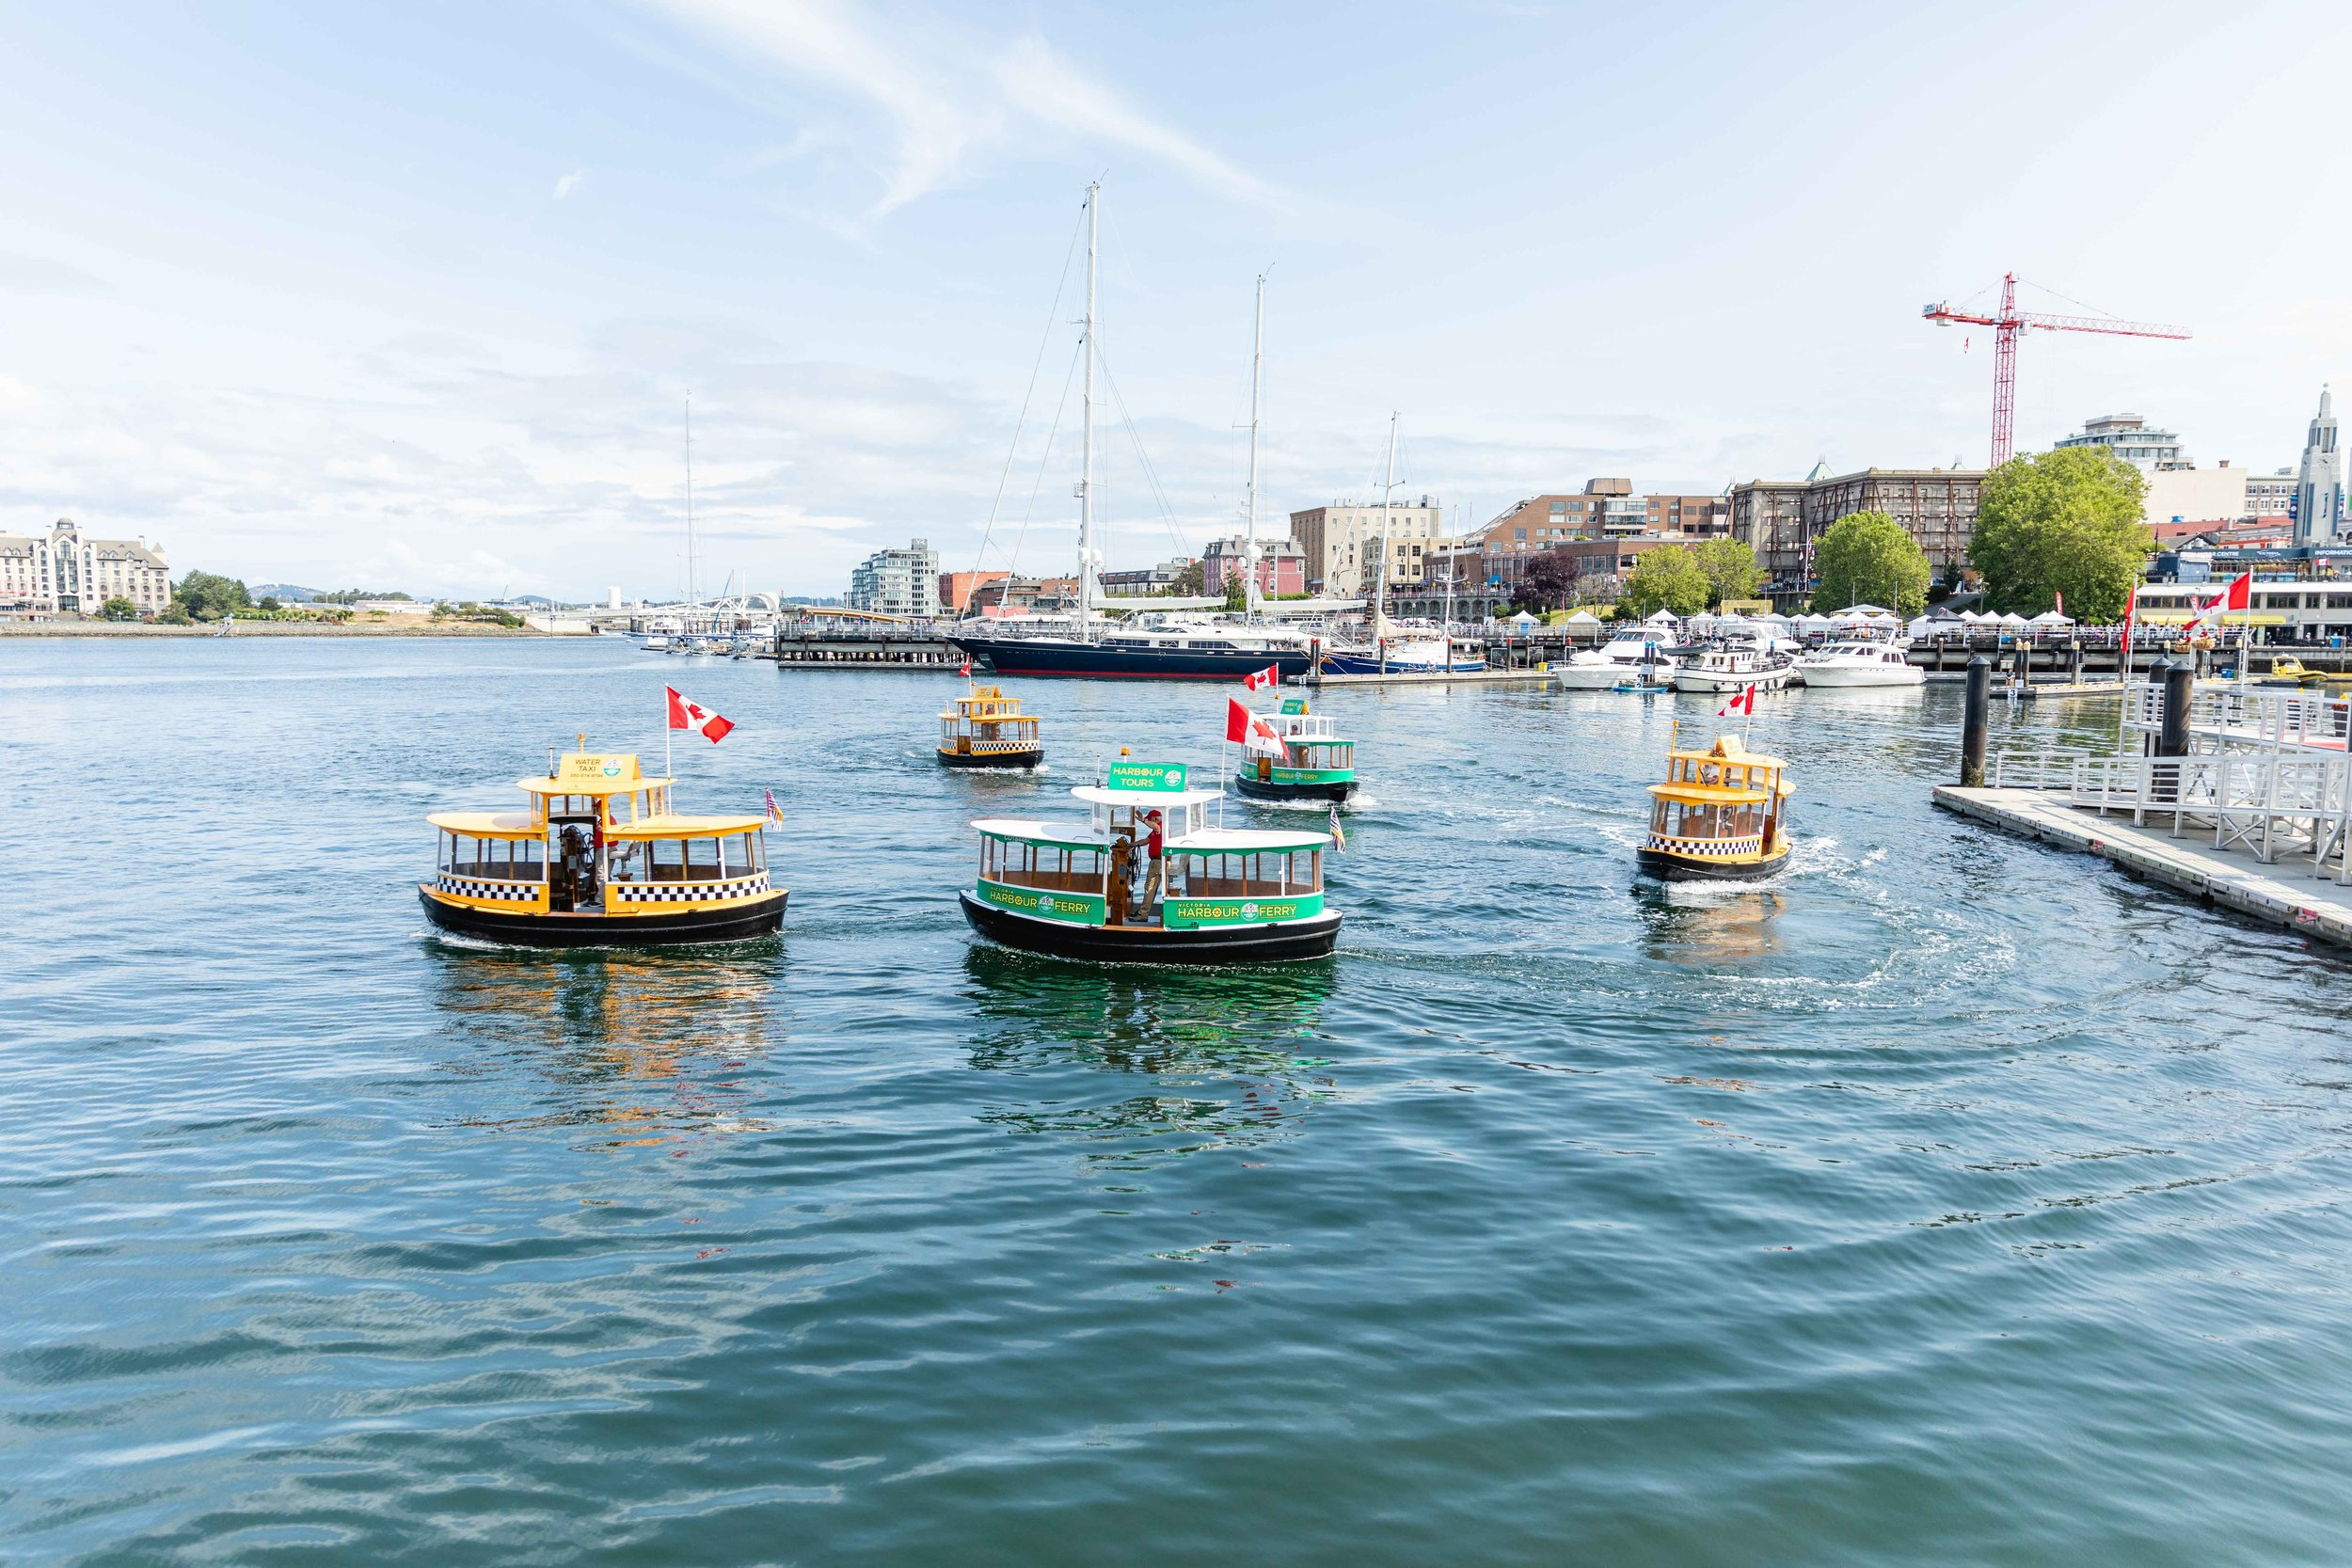 Water Ballet - Victoria Harbour Ferry